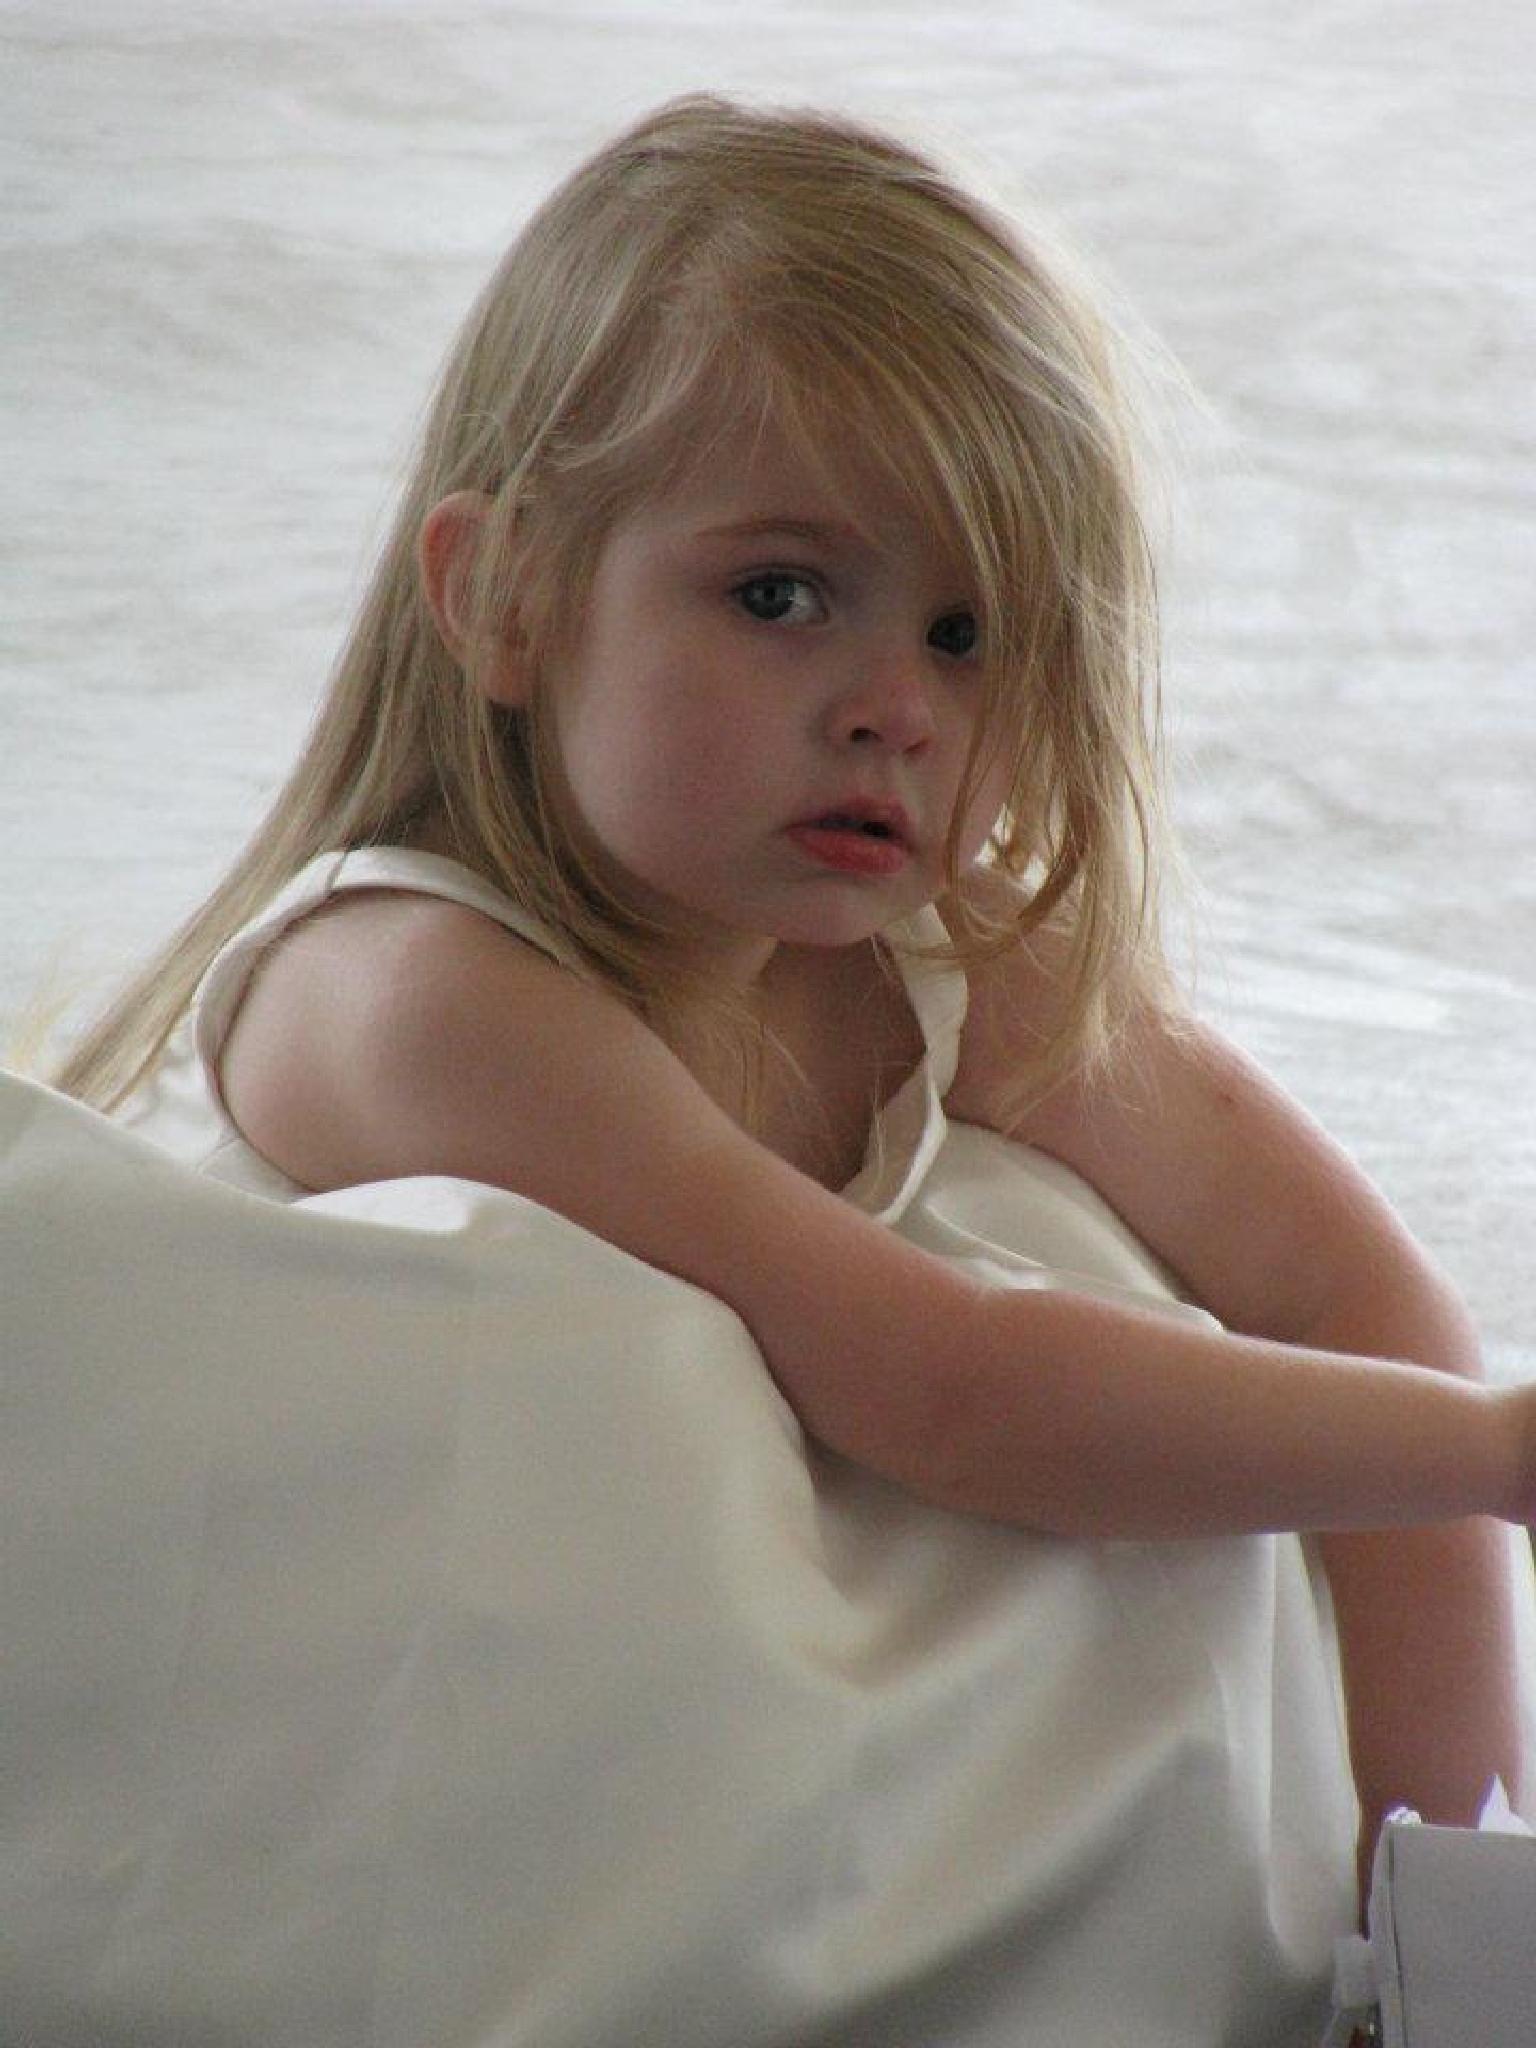 Girl in White by robin.smith.3150